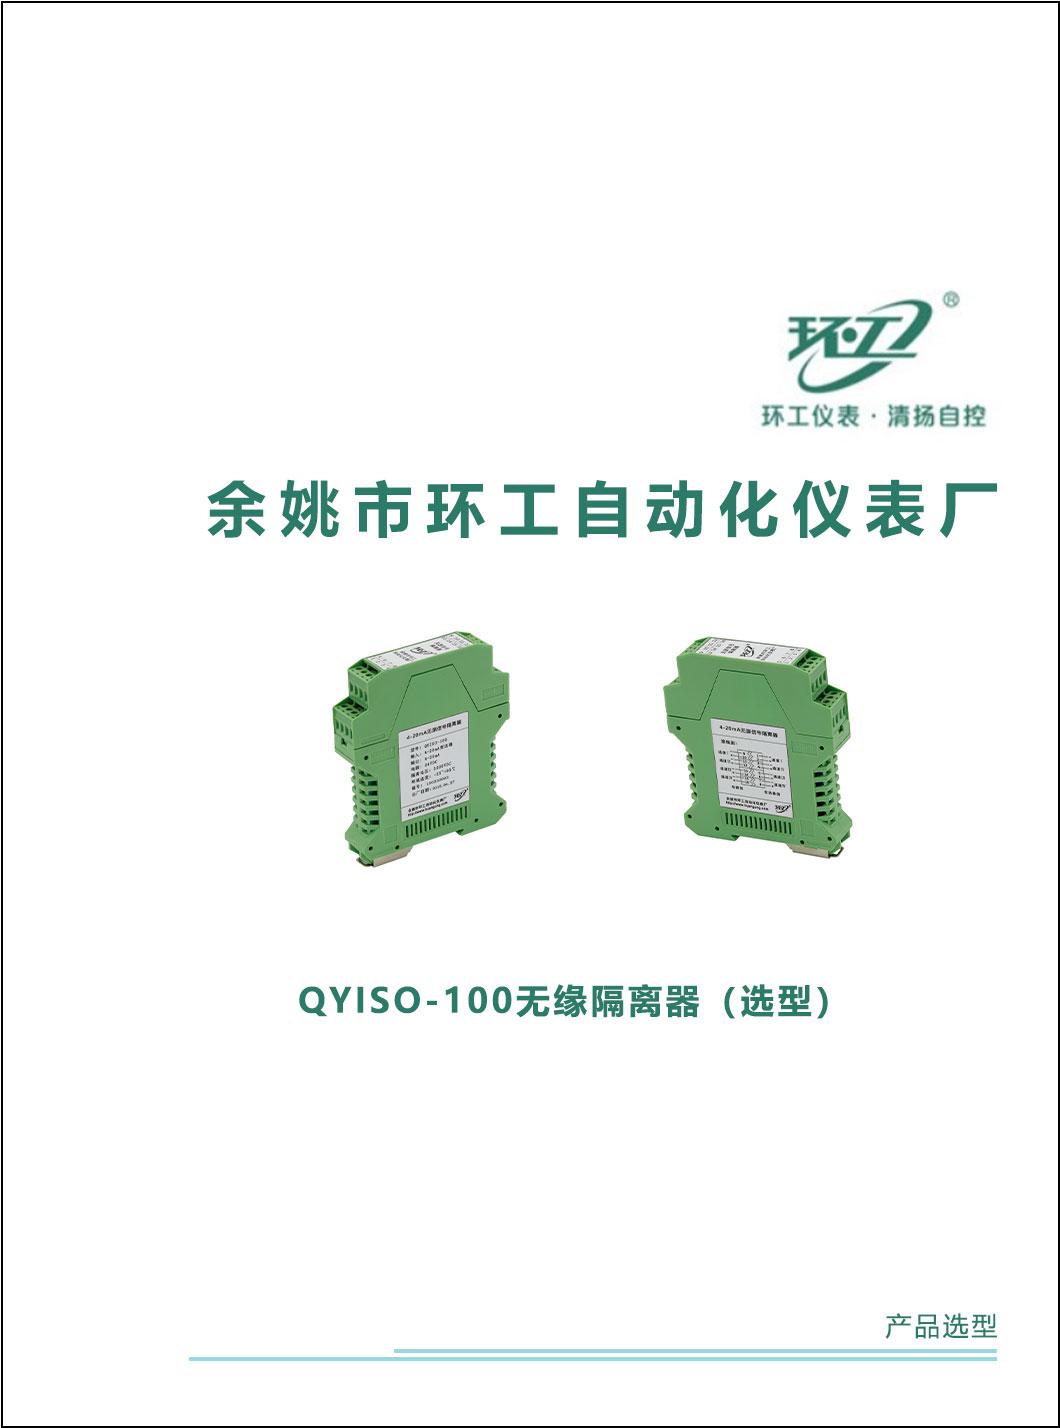 QYISO-100无缘隔离器-环工仪表-清扬自控